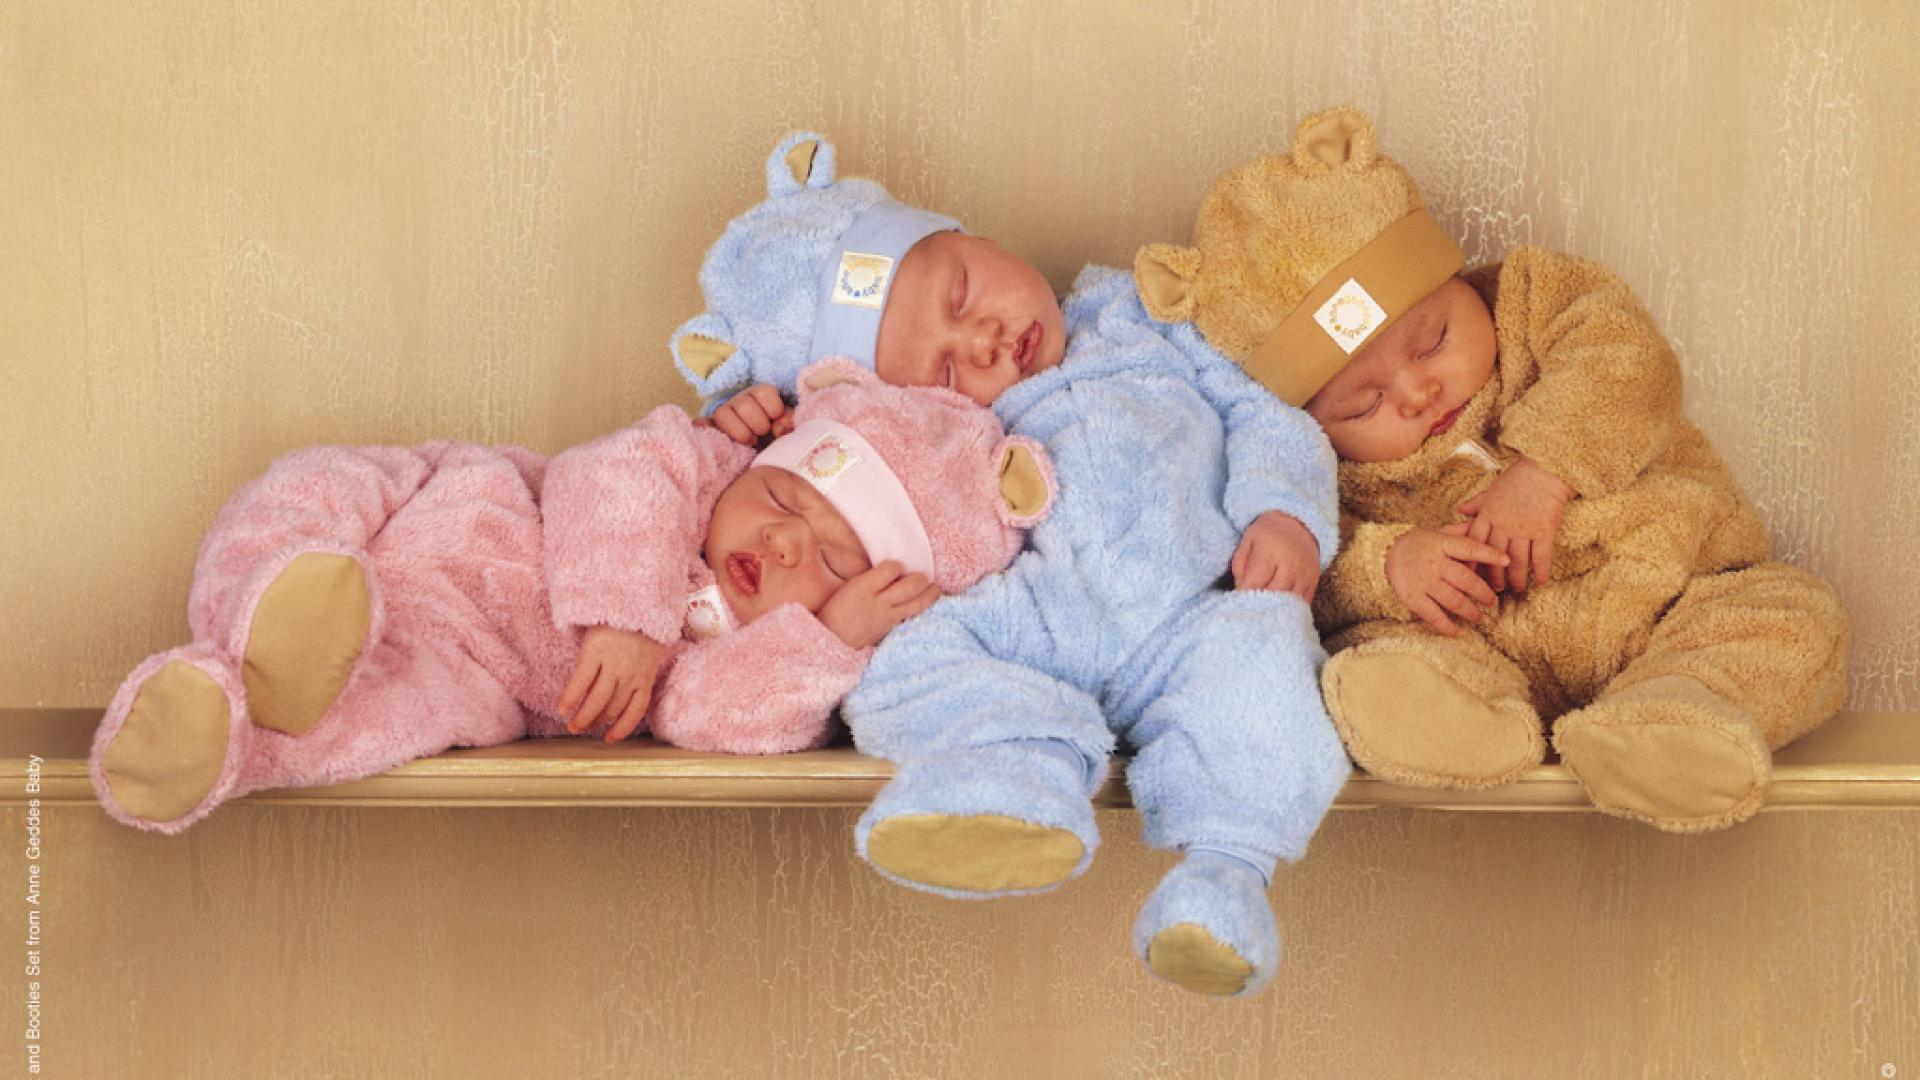 cute baby hd widescreen wallpaper 1233 blissful babies